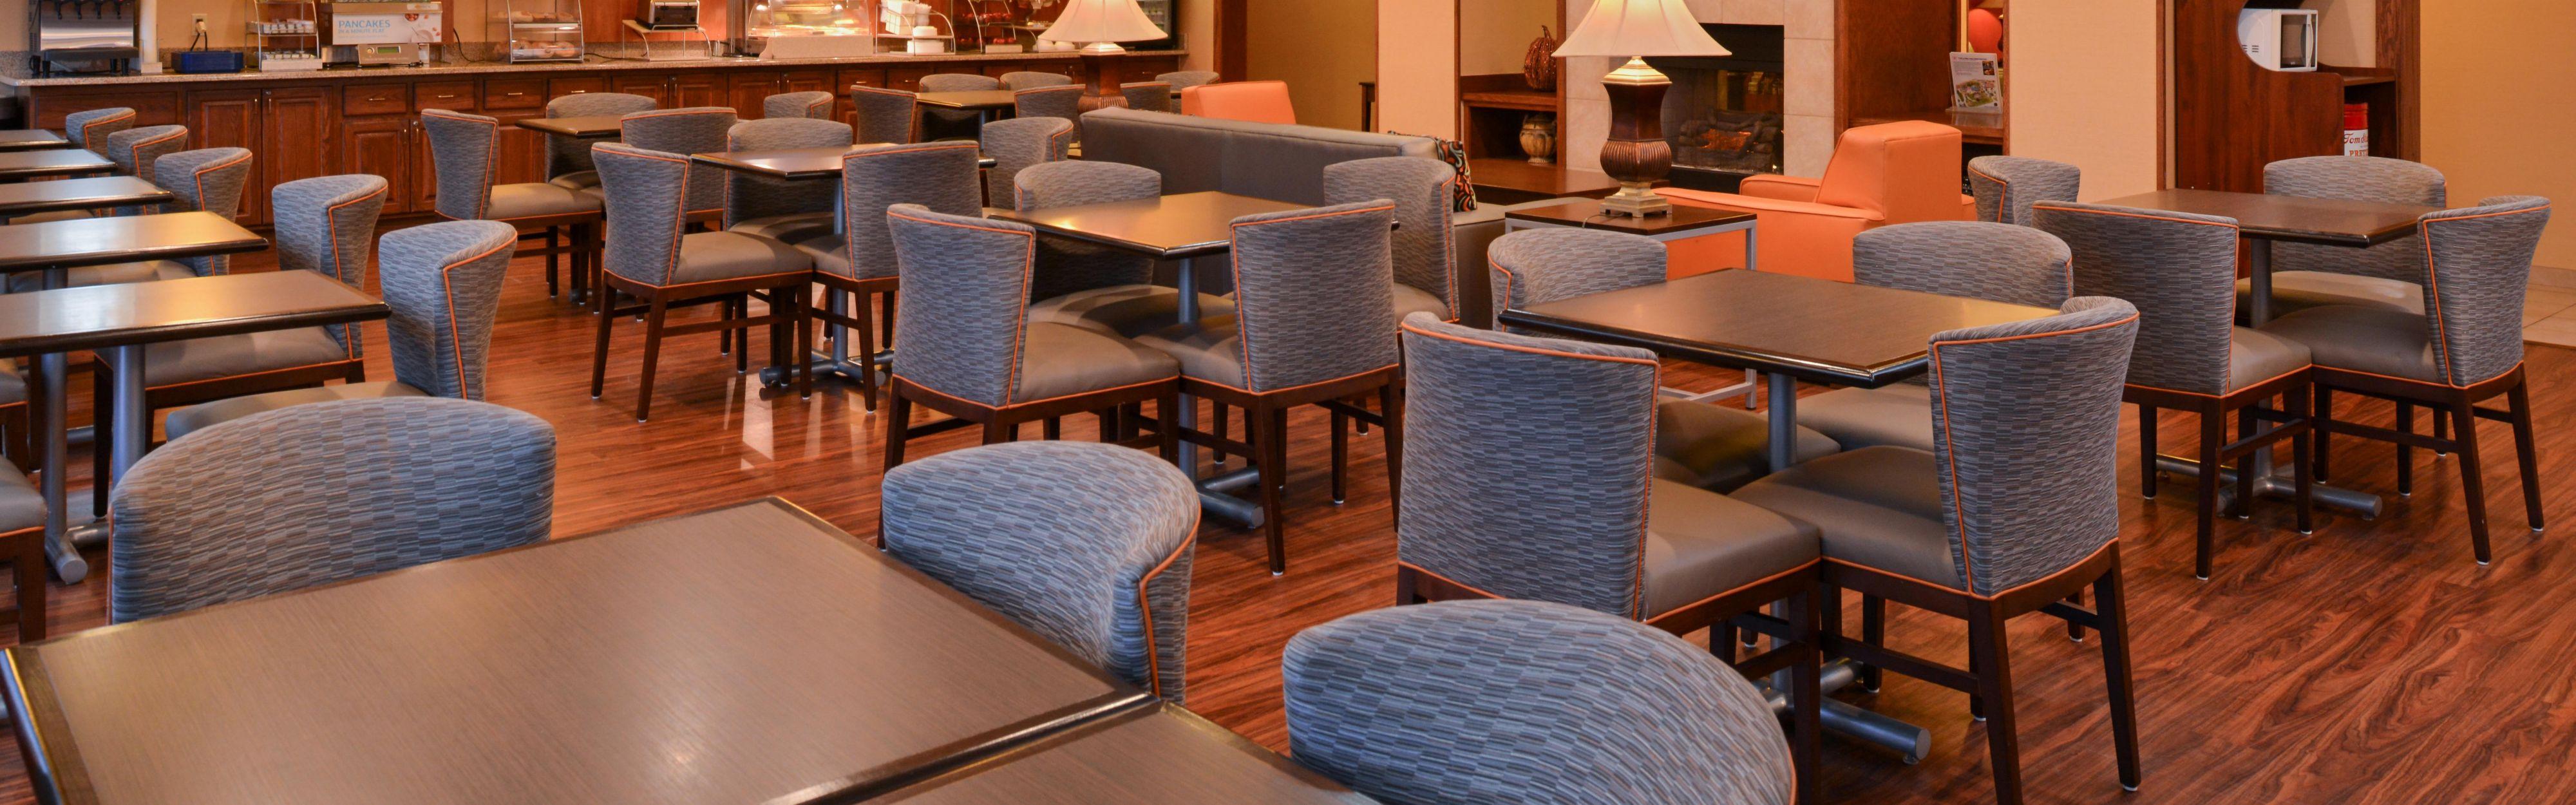 Holiday Inn Express & Suites Lancaster-Lititz image 2